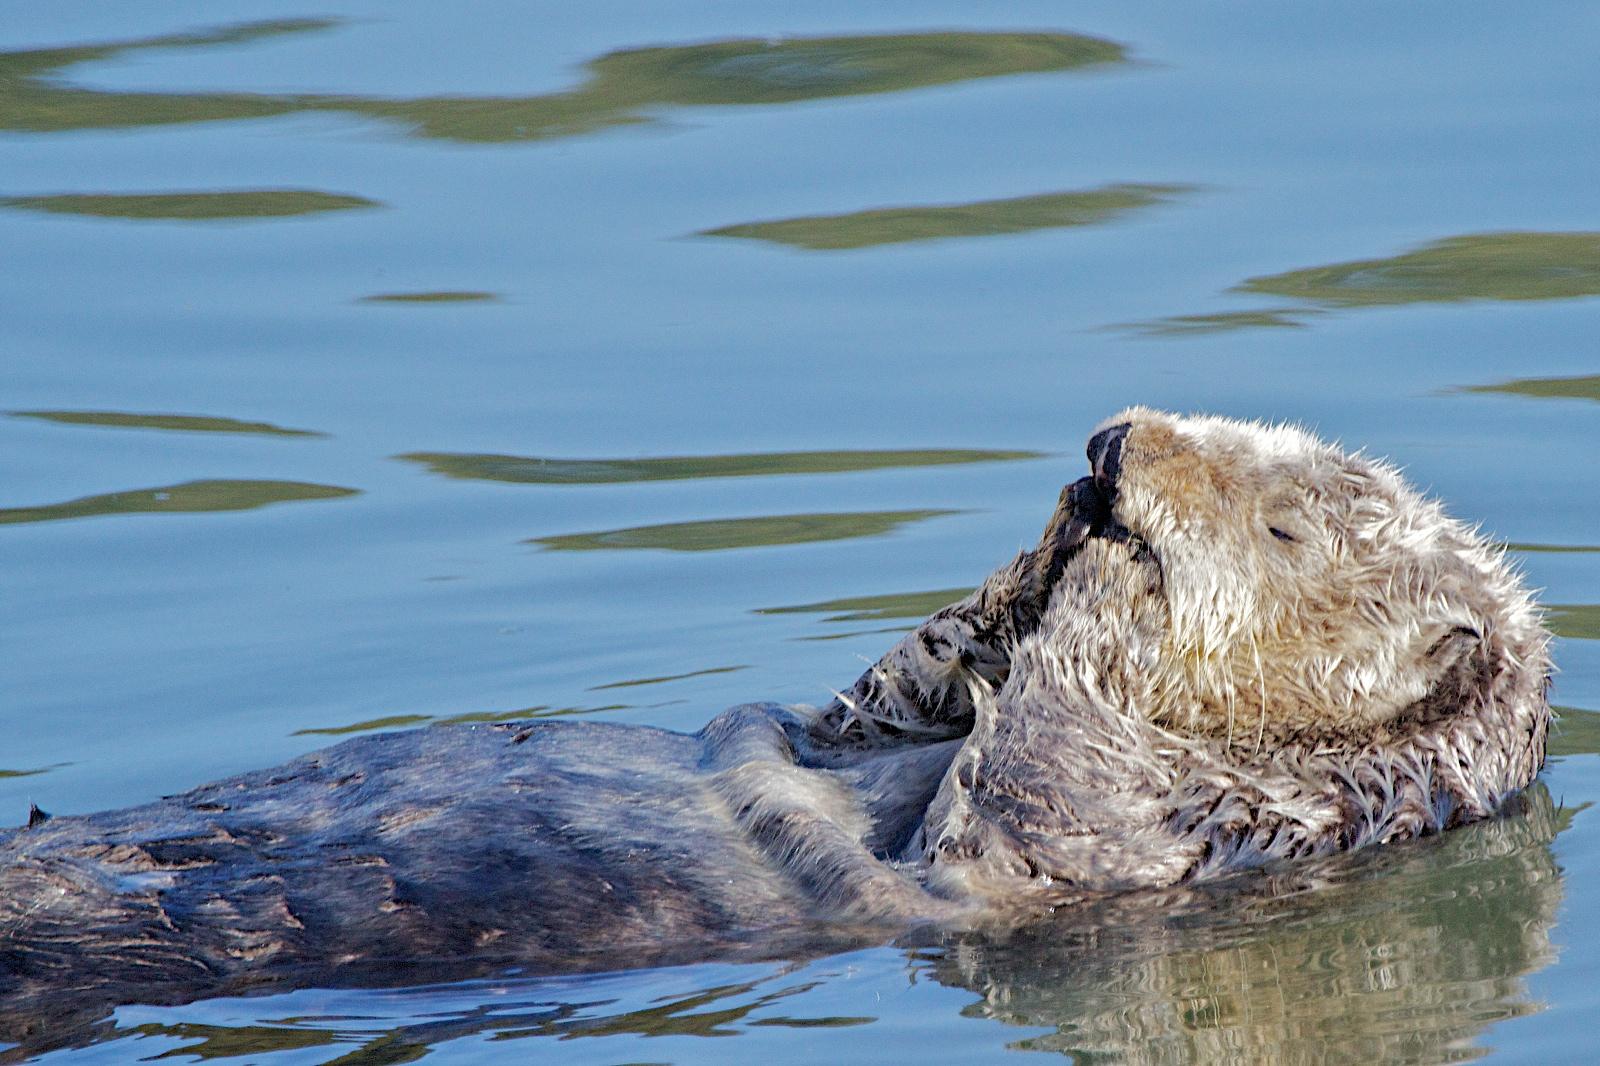 Voyagers: Moss Landing 看海瀨 (Sea Otter) 與賞鳥